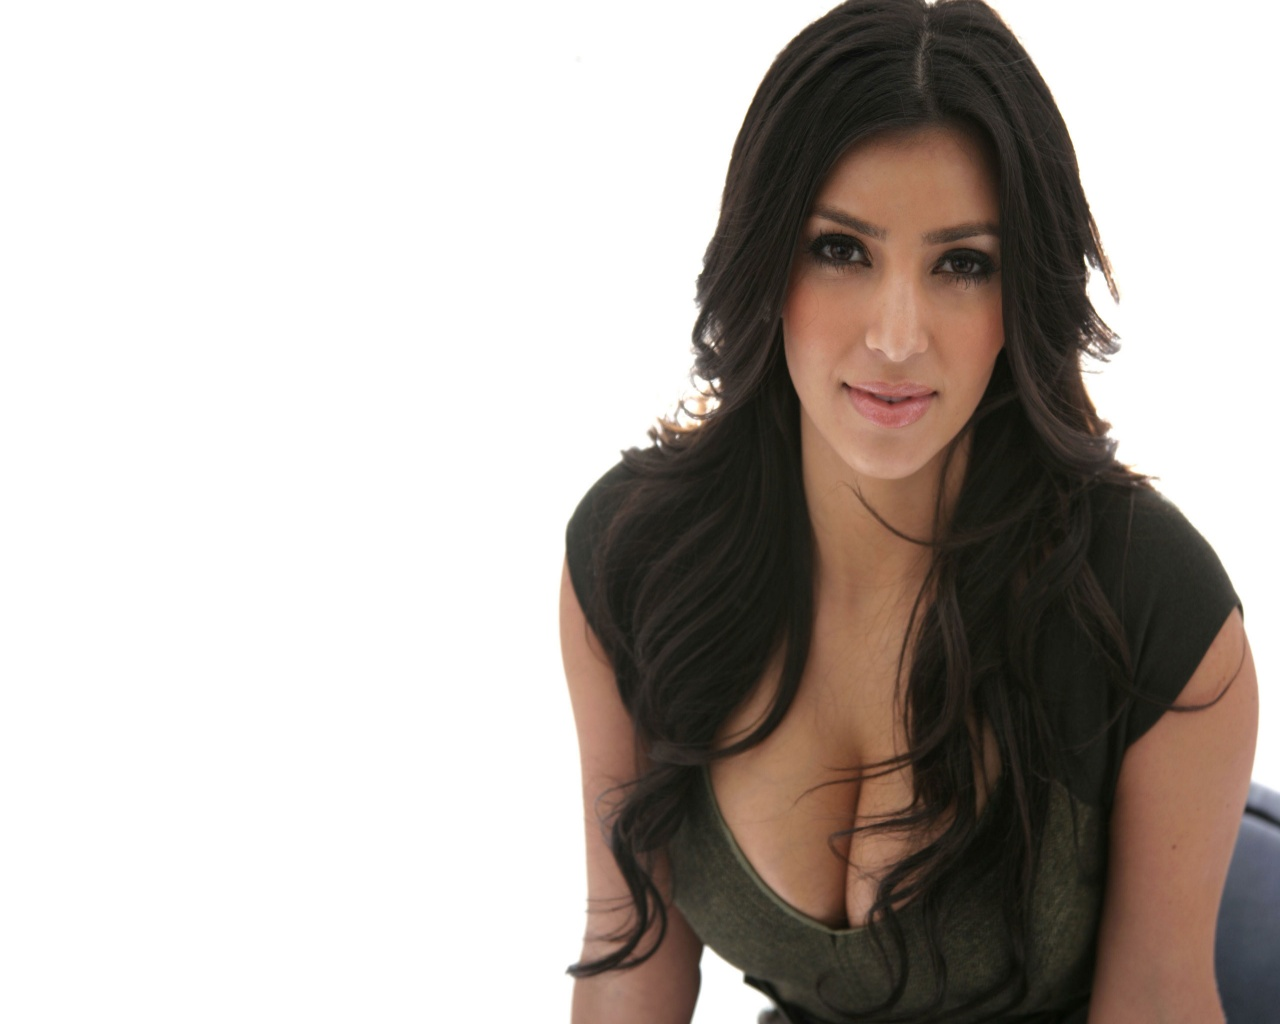 http://3.bp.blogspot.com/-gdrEIoYYQzA/TYi1YU-rR7I/AAAAAAAAFCU/PKQxQdiNnw4/s1600/kim_kardashian_hot_wallpaper_05.jpg